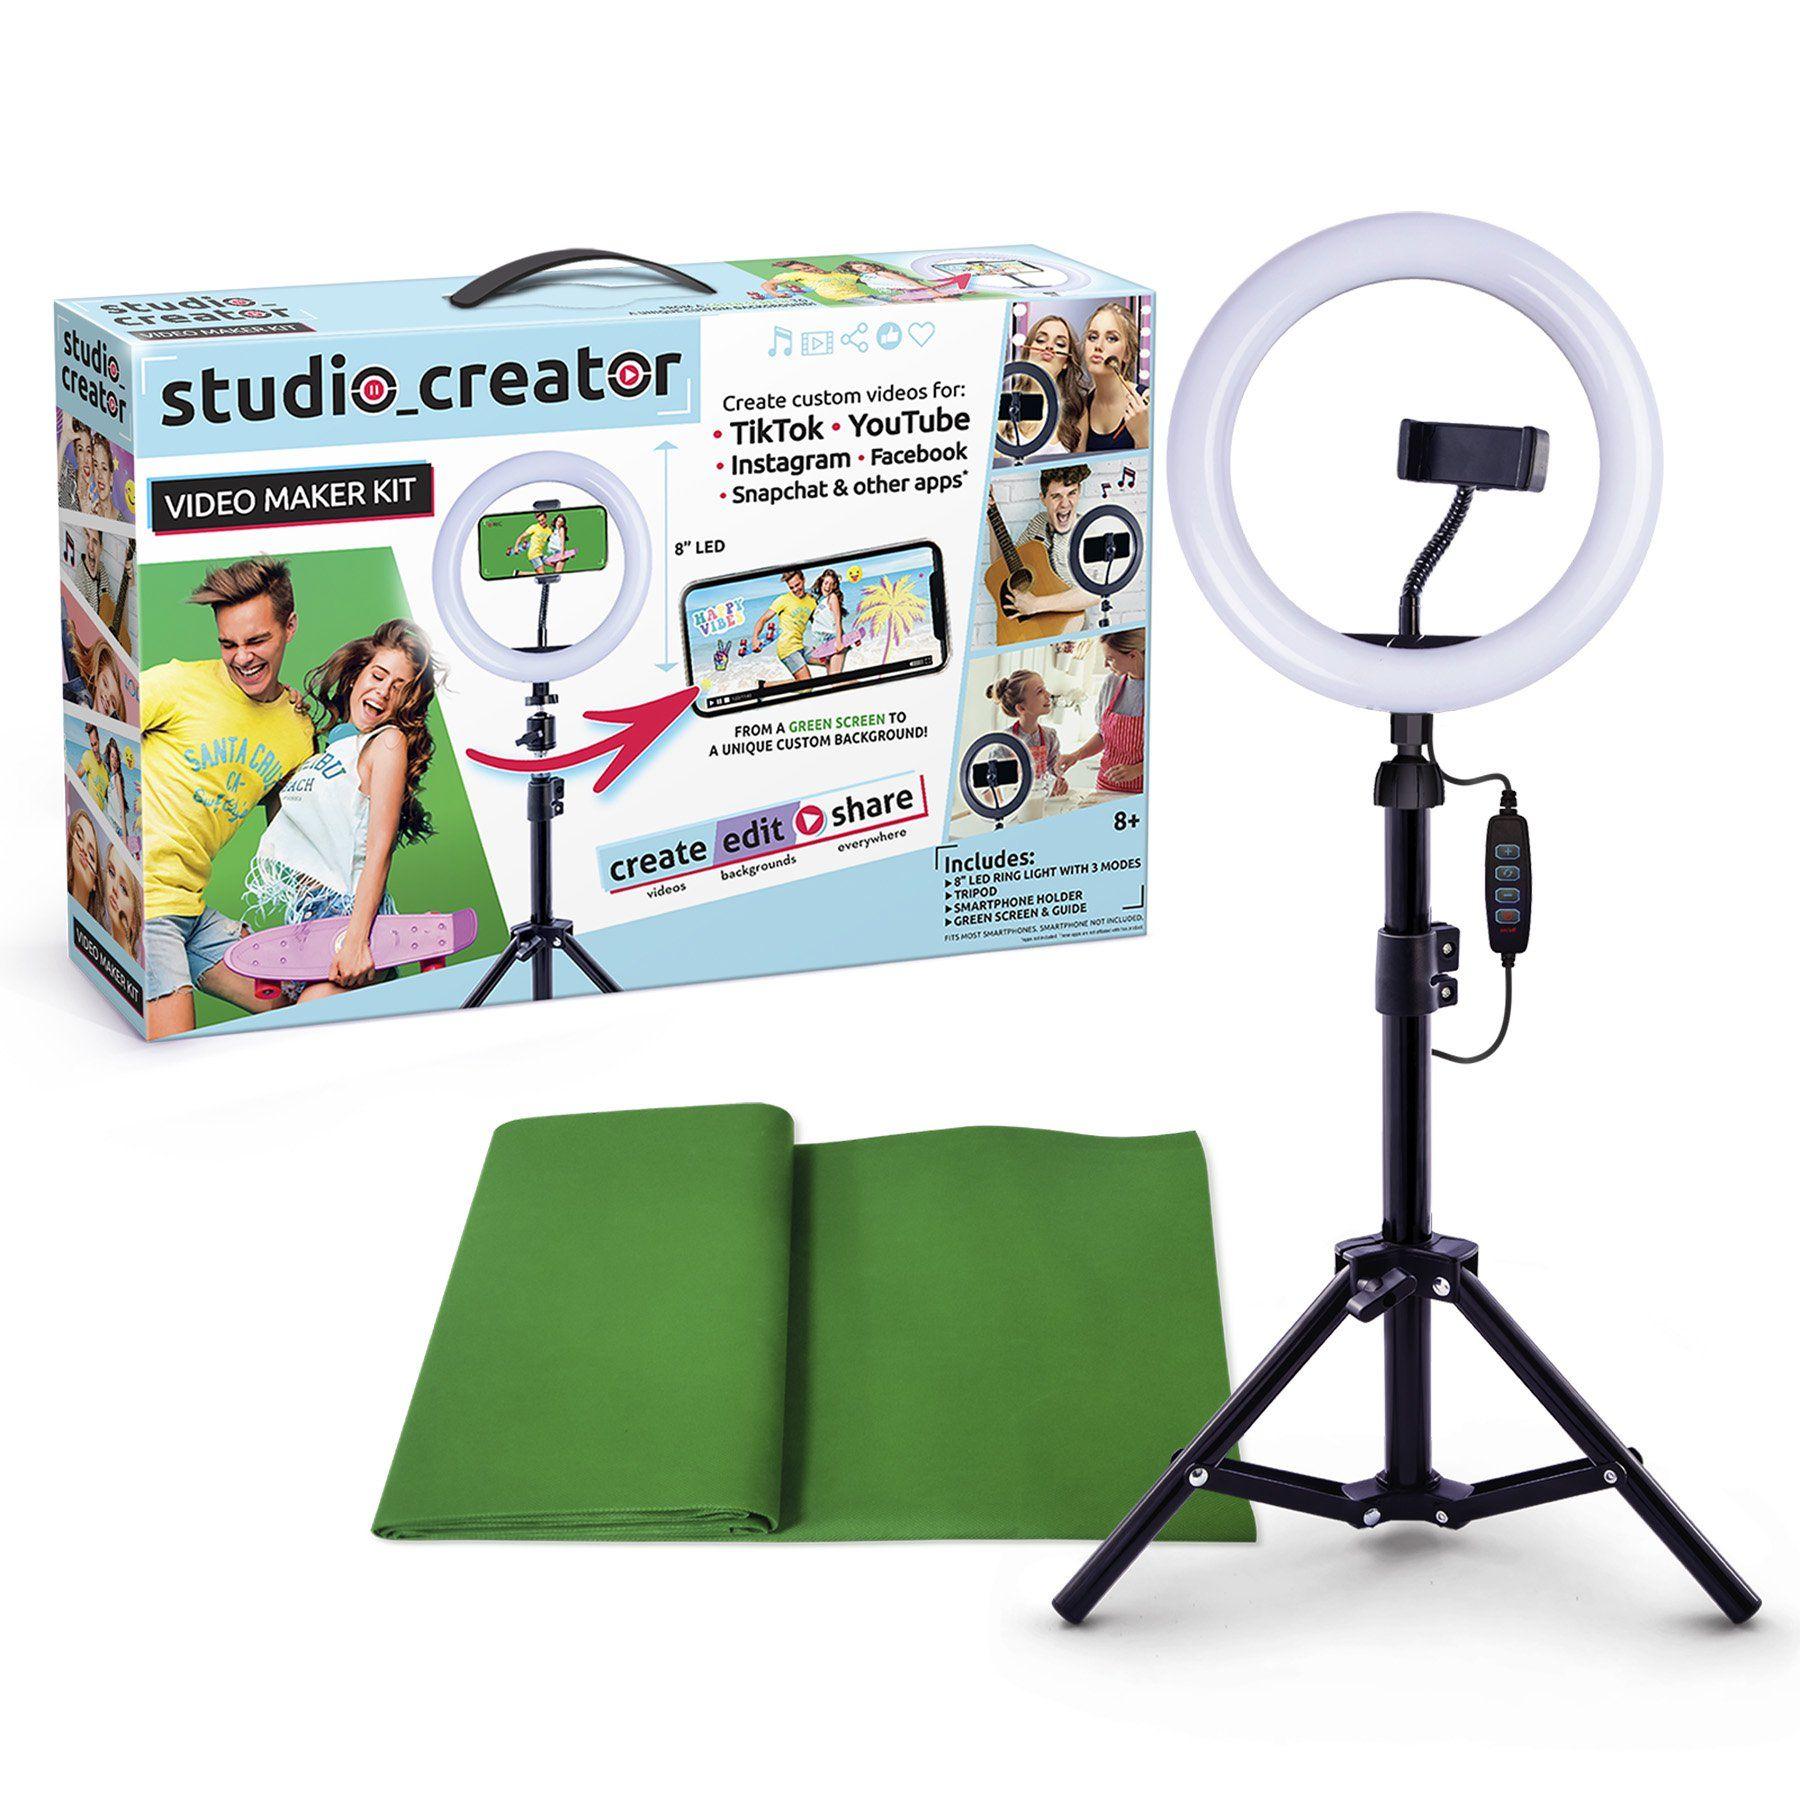 Studio Creator Video Maker Kit Create Your Very Own Social Videos Walmart Com Greenscreen Video Maker Instagram And Snapchat